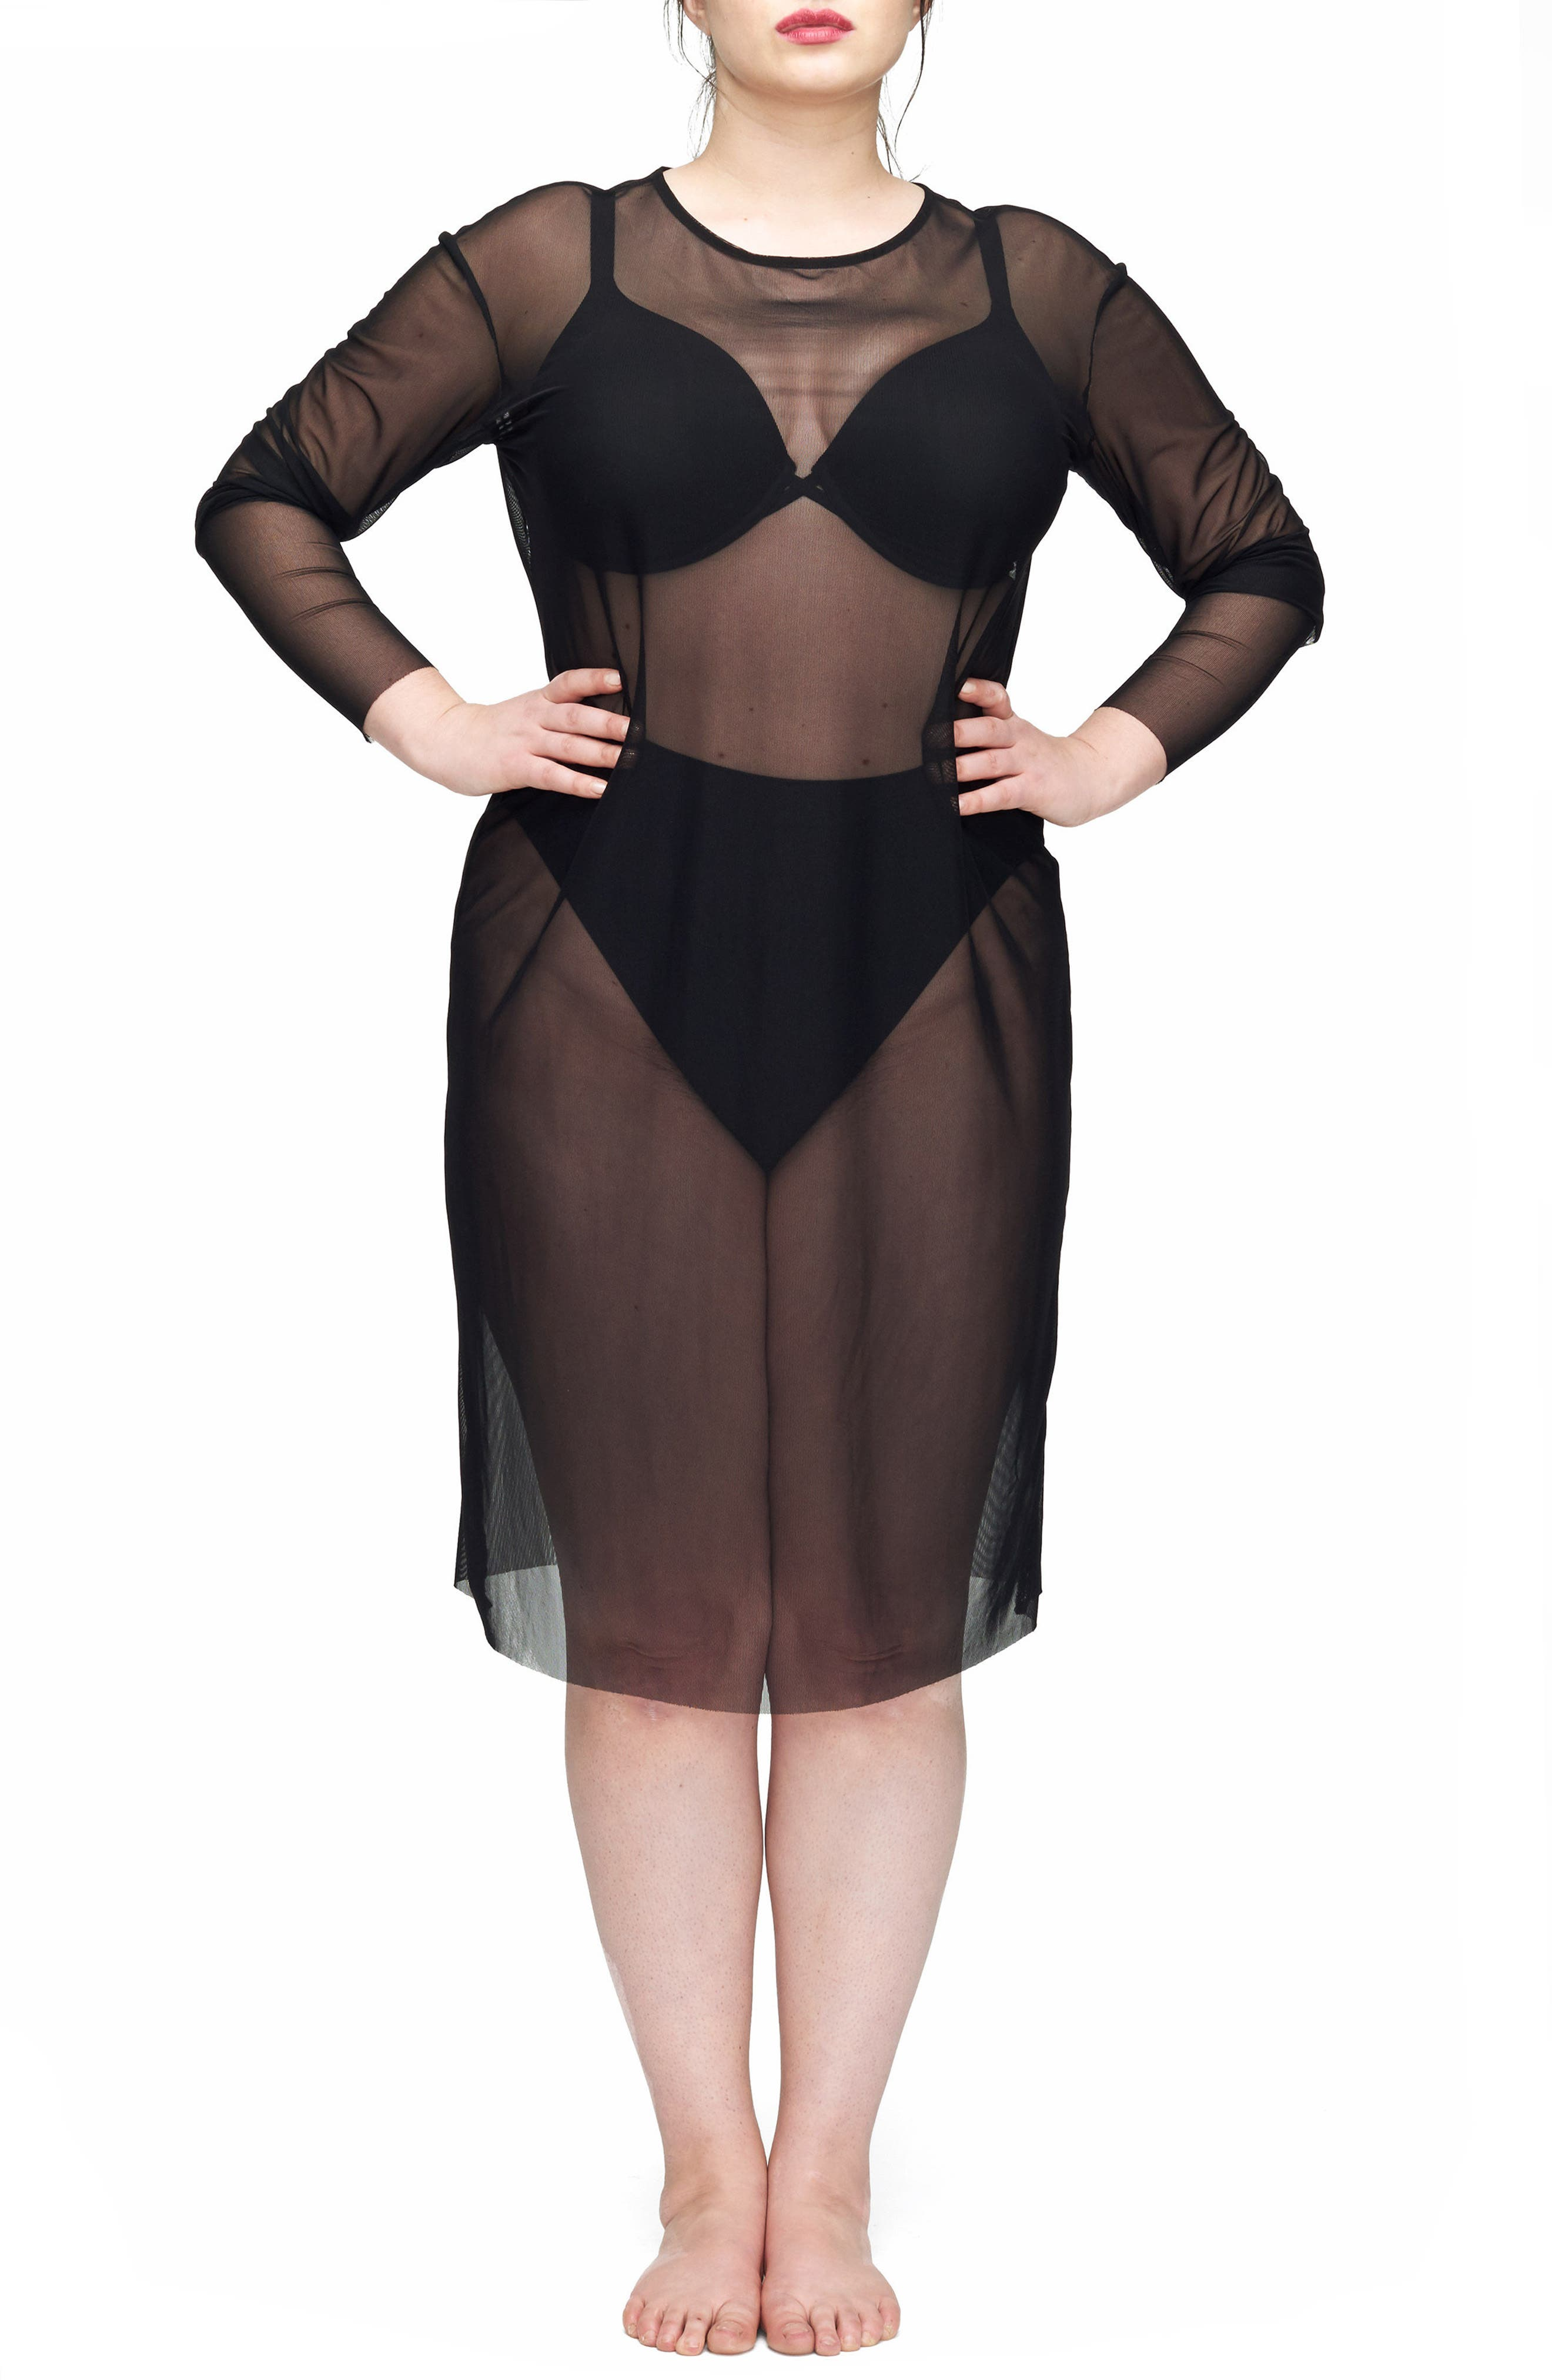 Thames Fog Sheer Dress,                             Main thumbnail 1, color,                             BLACK